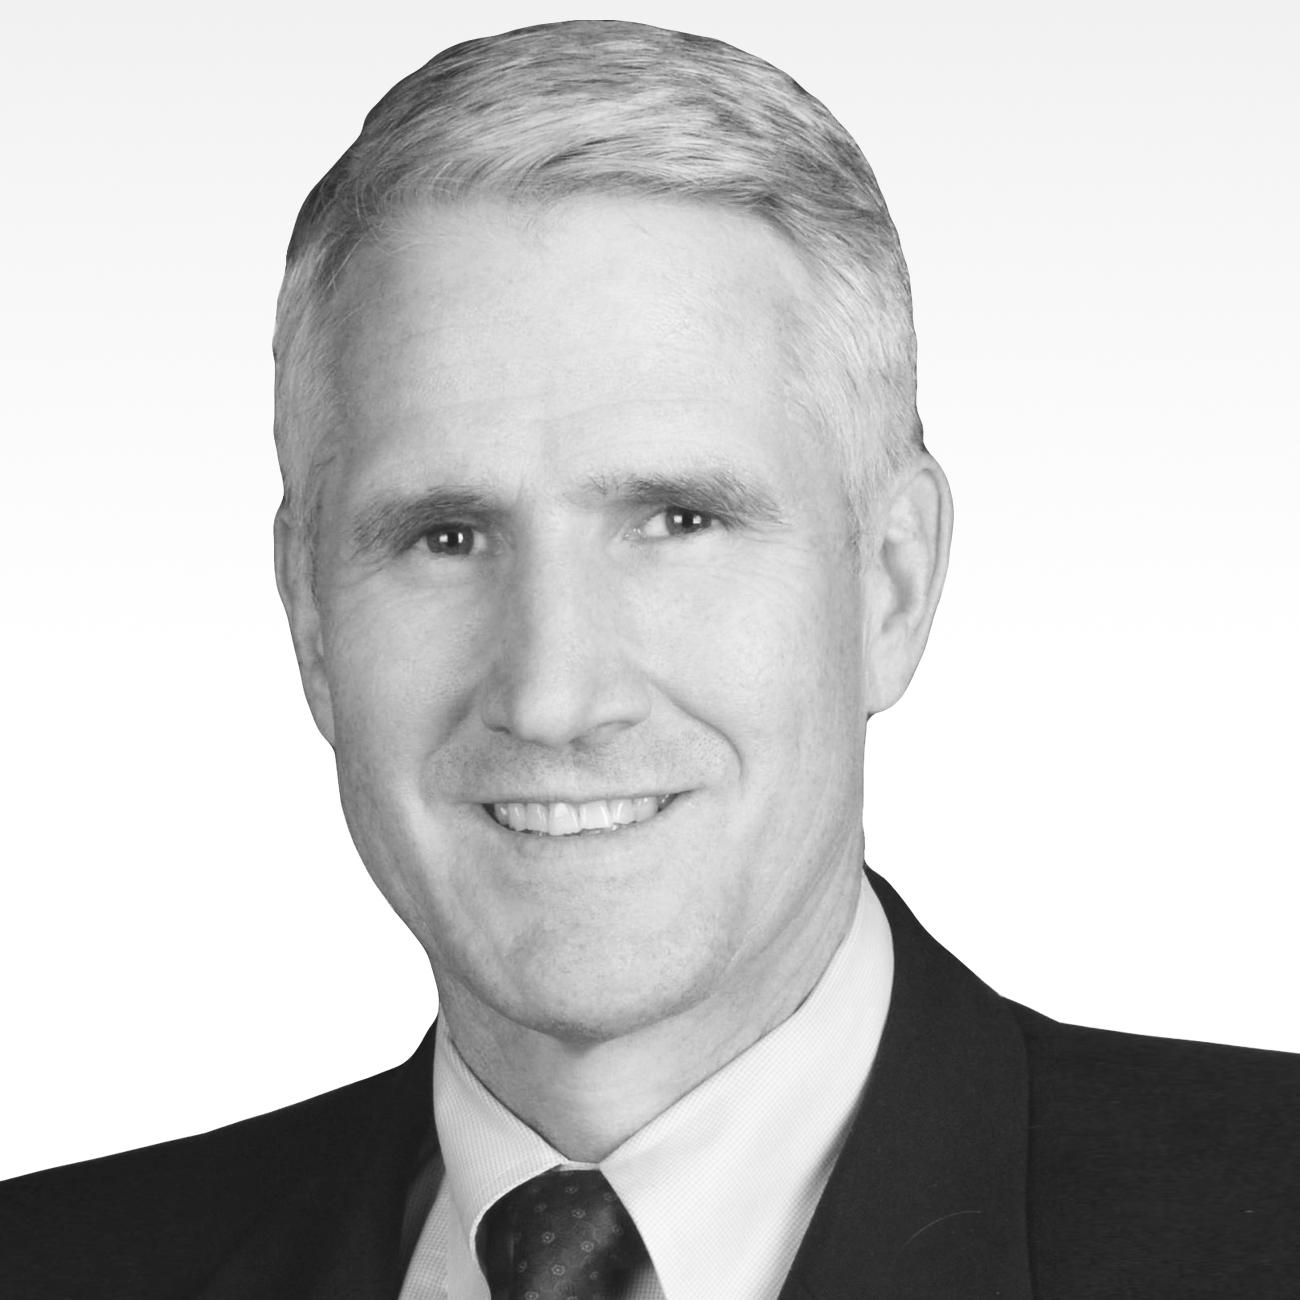 Brigadier General Mark Kimmitt